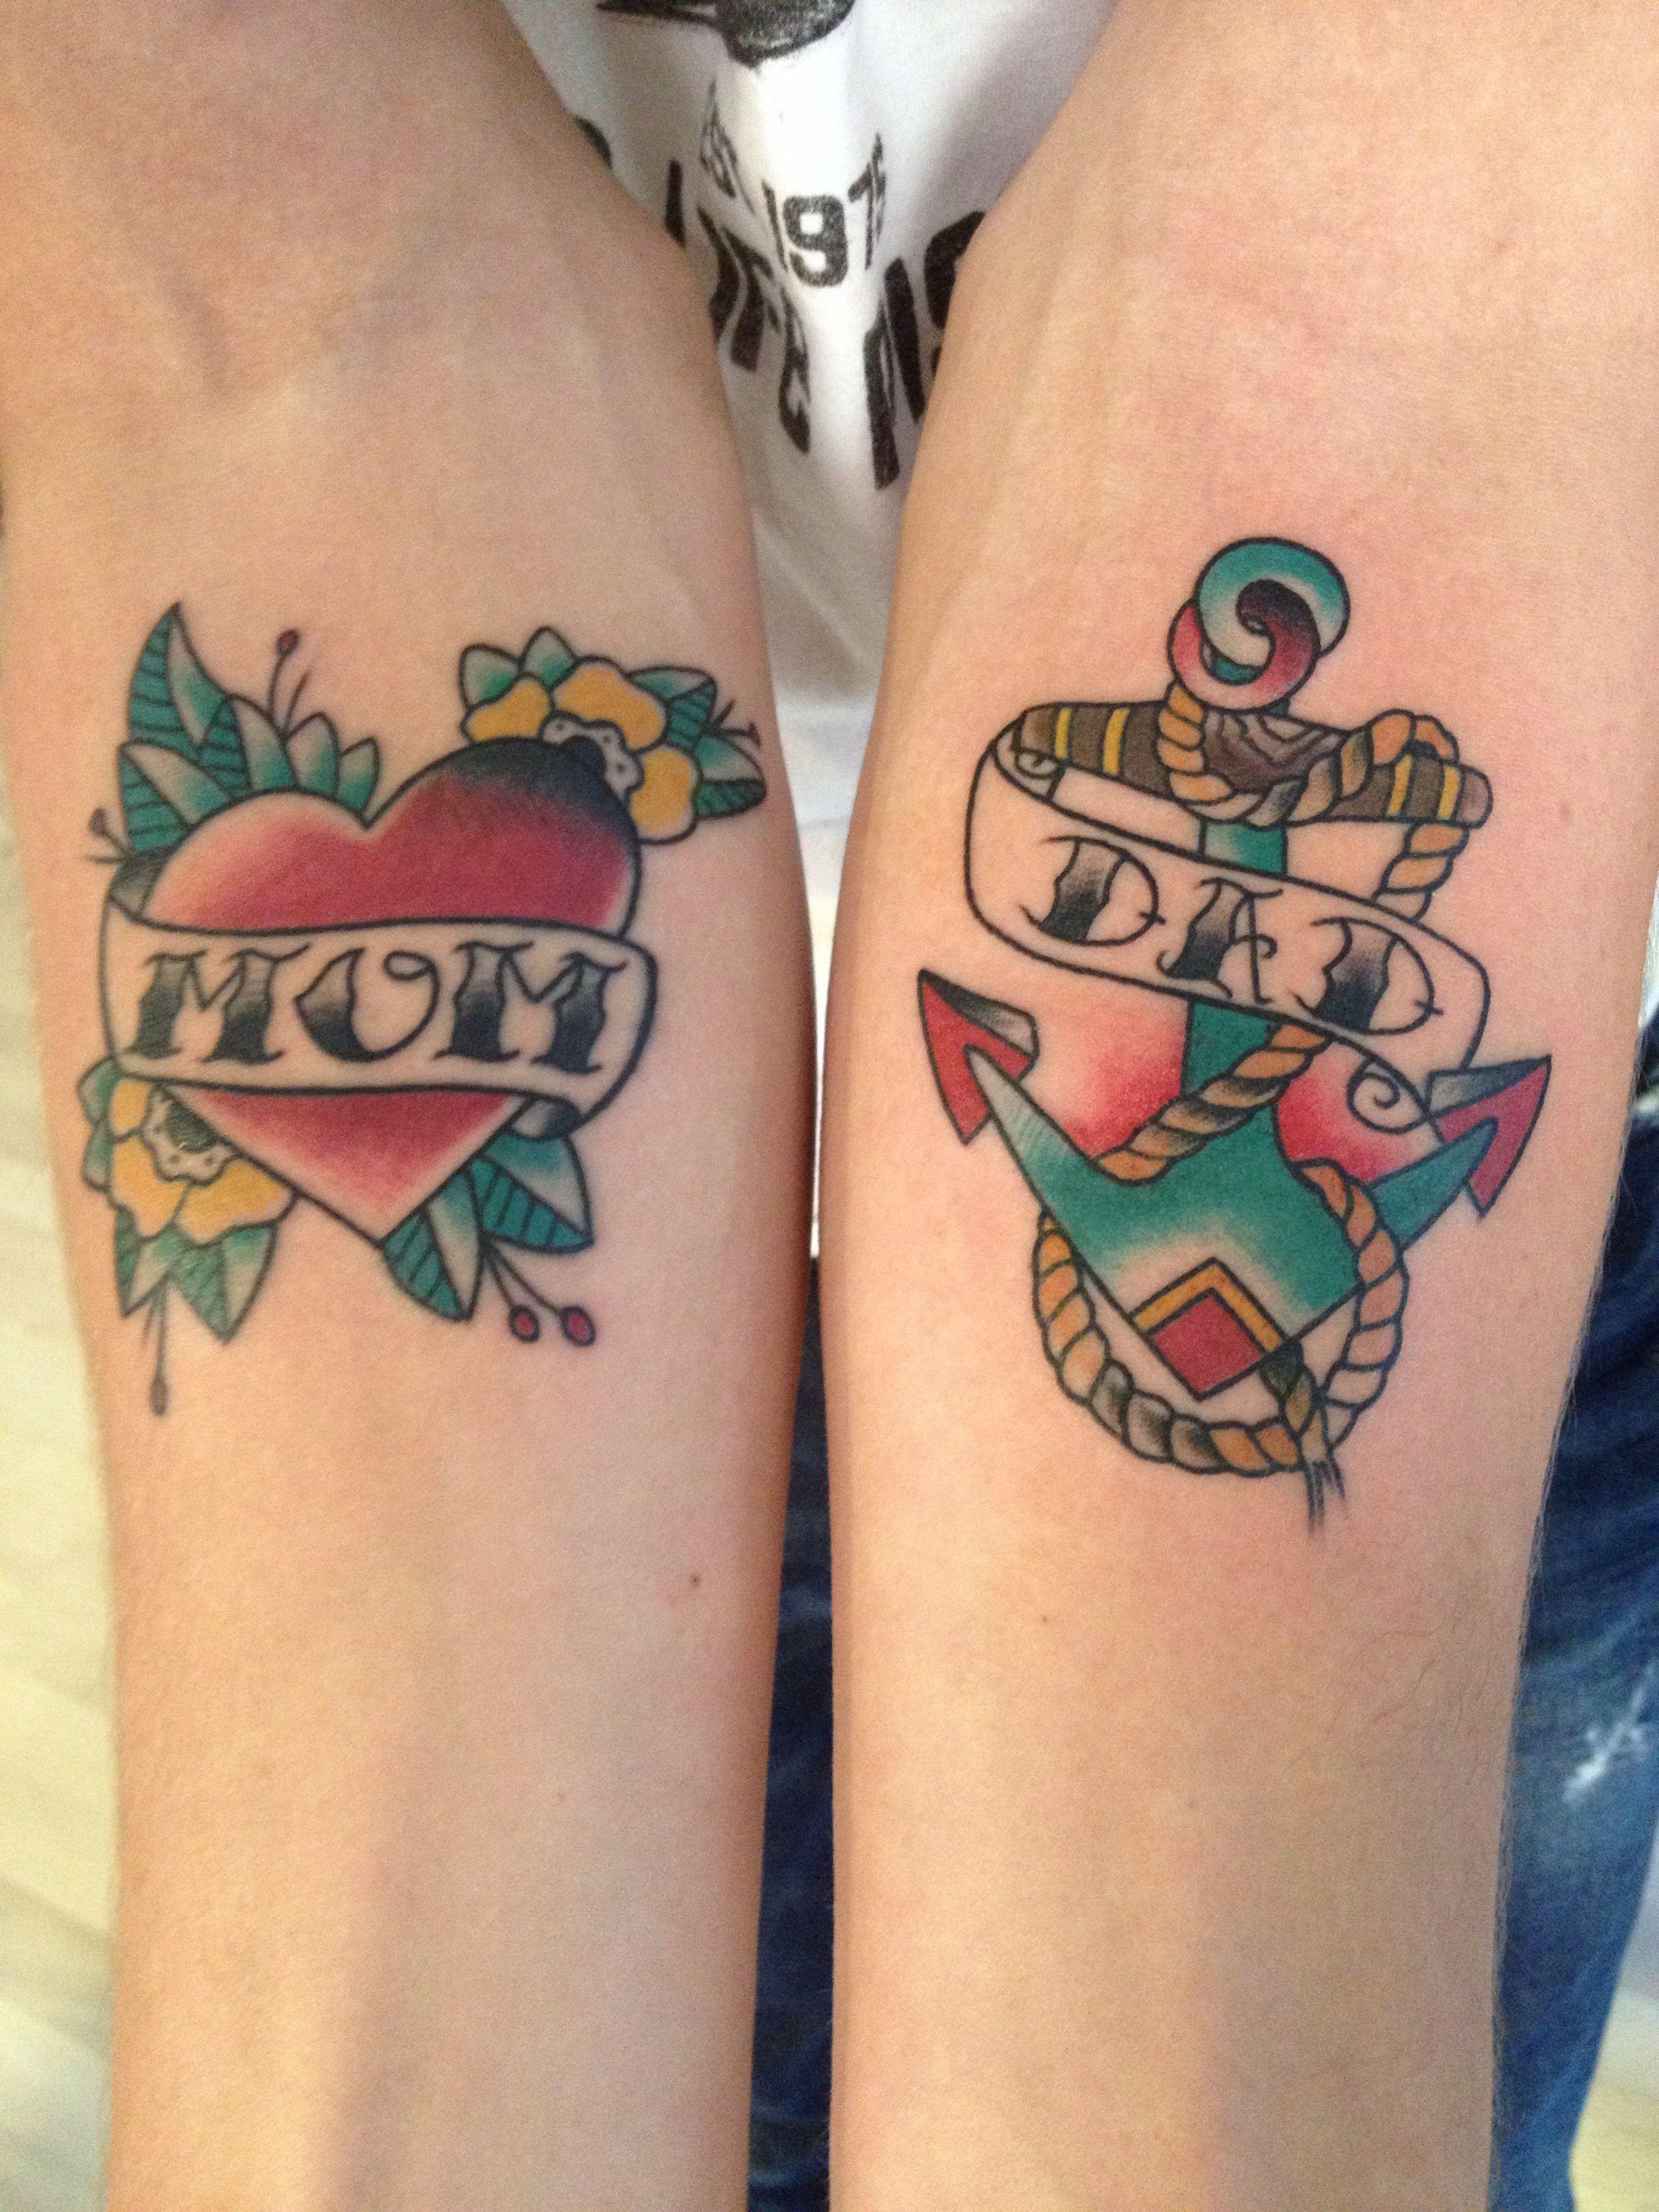 Old School Classic mom and dad Mom tattoos, Tattoos, Mom